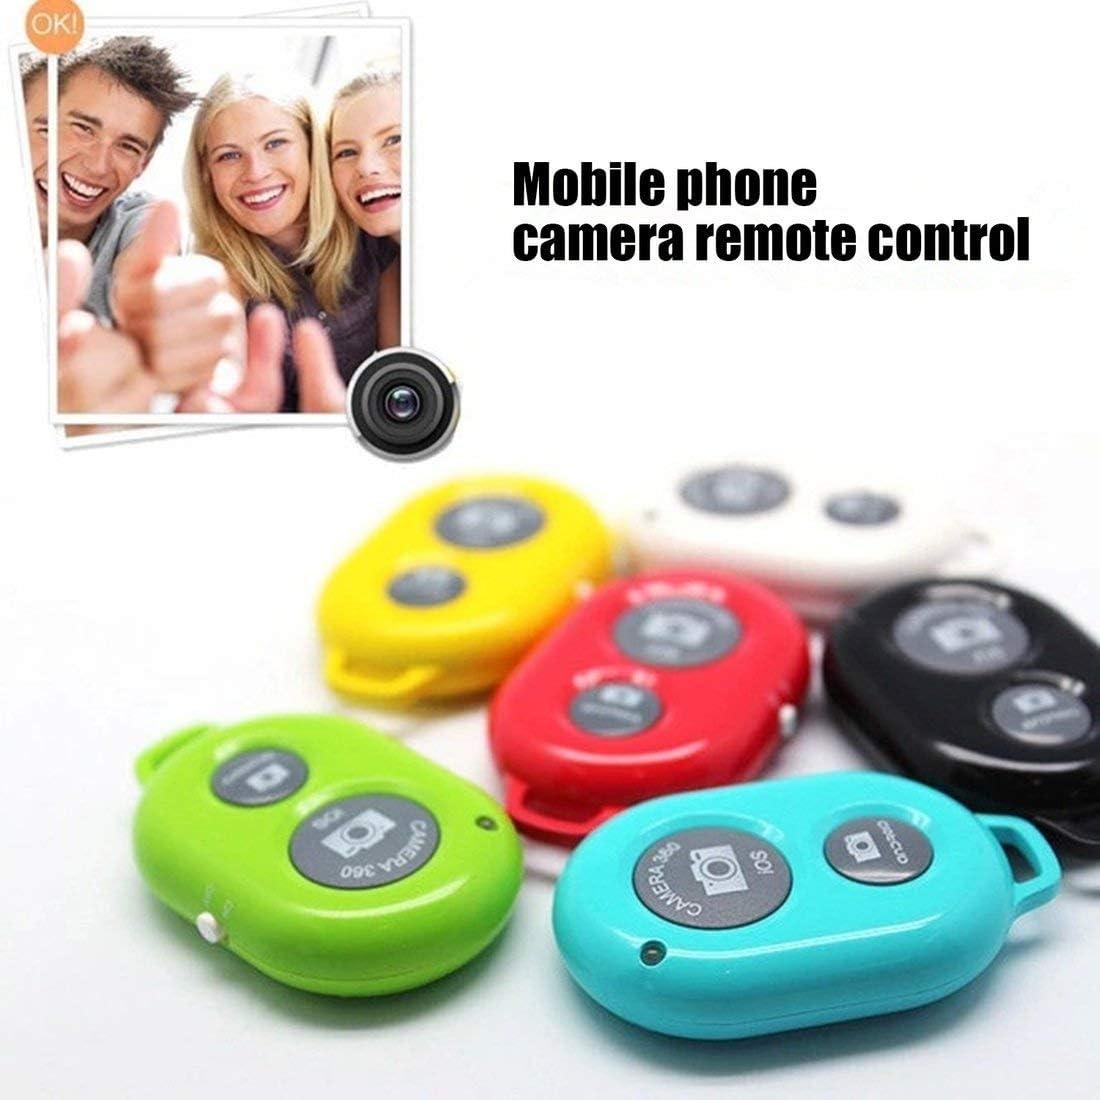 Formulaone Wiereless Phone Selbstausl/öser Ausl/öser f/ür iPhone 7 Selfie-Stick Ausl/öser Drahtlose Fernbedienung schwarz